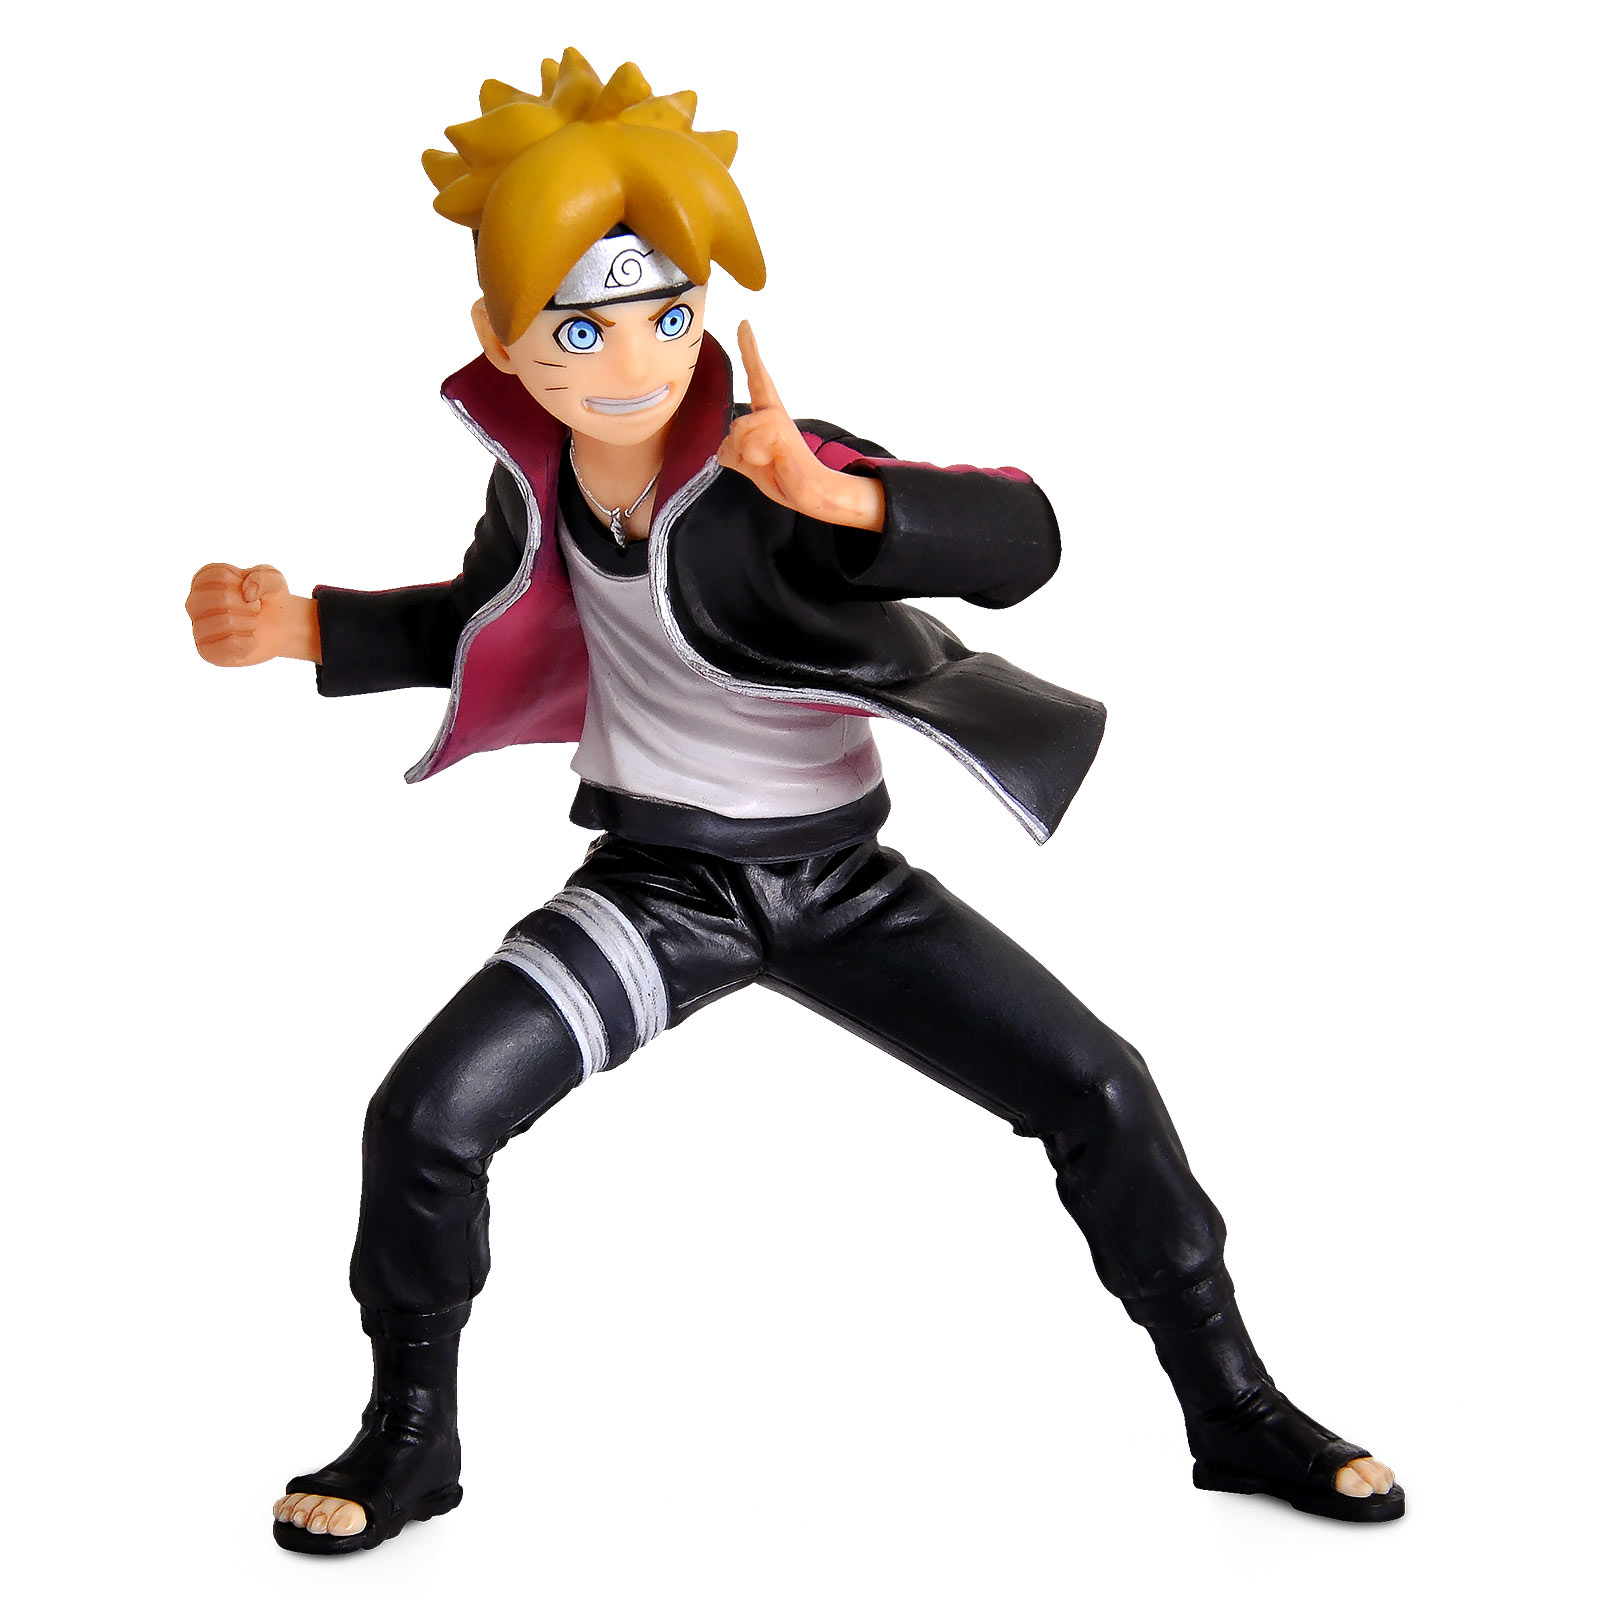 Boruto - Naruto Next Generation - Boruto Figur 10 cm